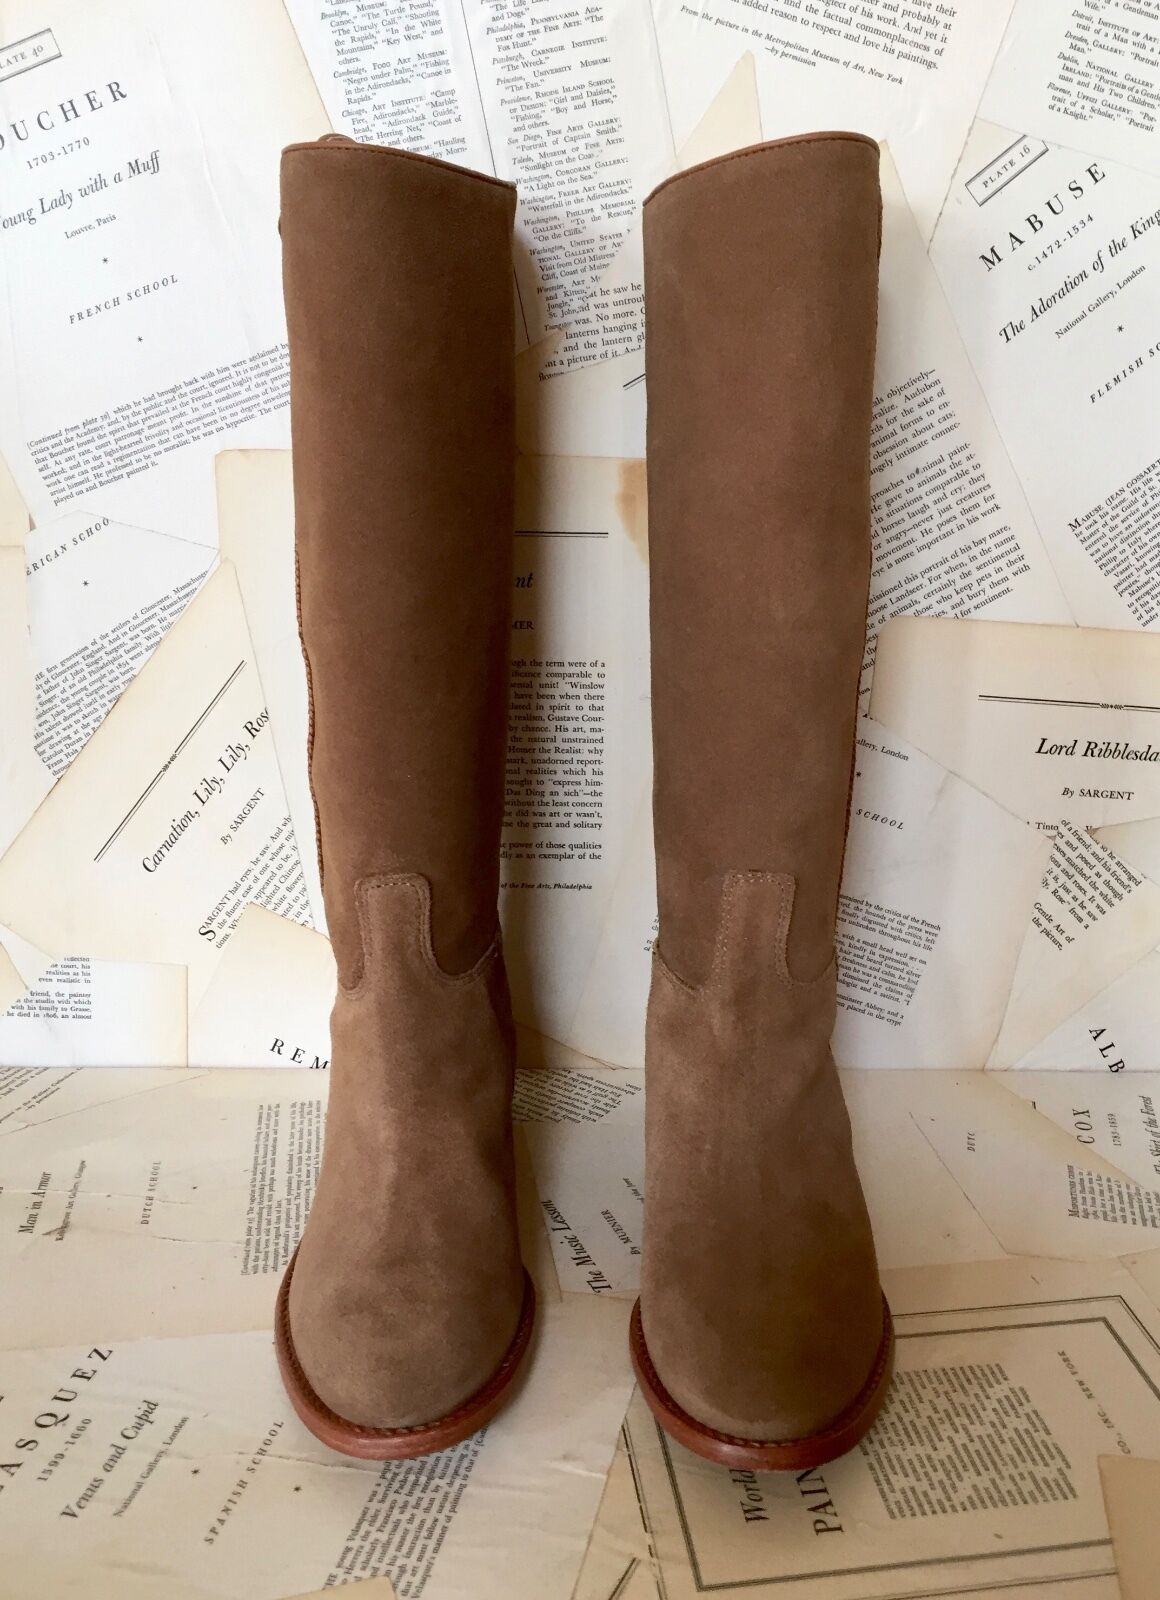 Nuevo En Caja anthropologie en Bota ante lado Trenza Hebilla Tire de Bota en de montar a caballo 6 f19458